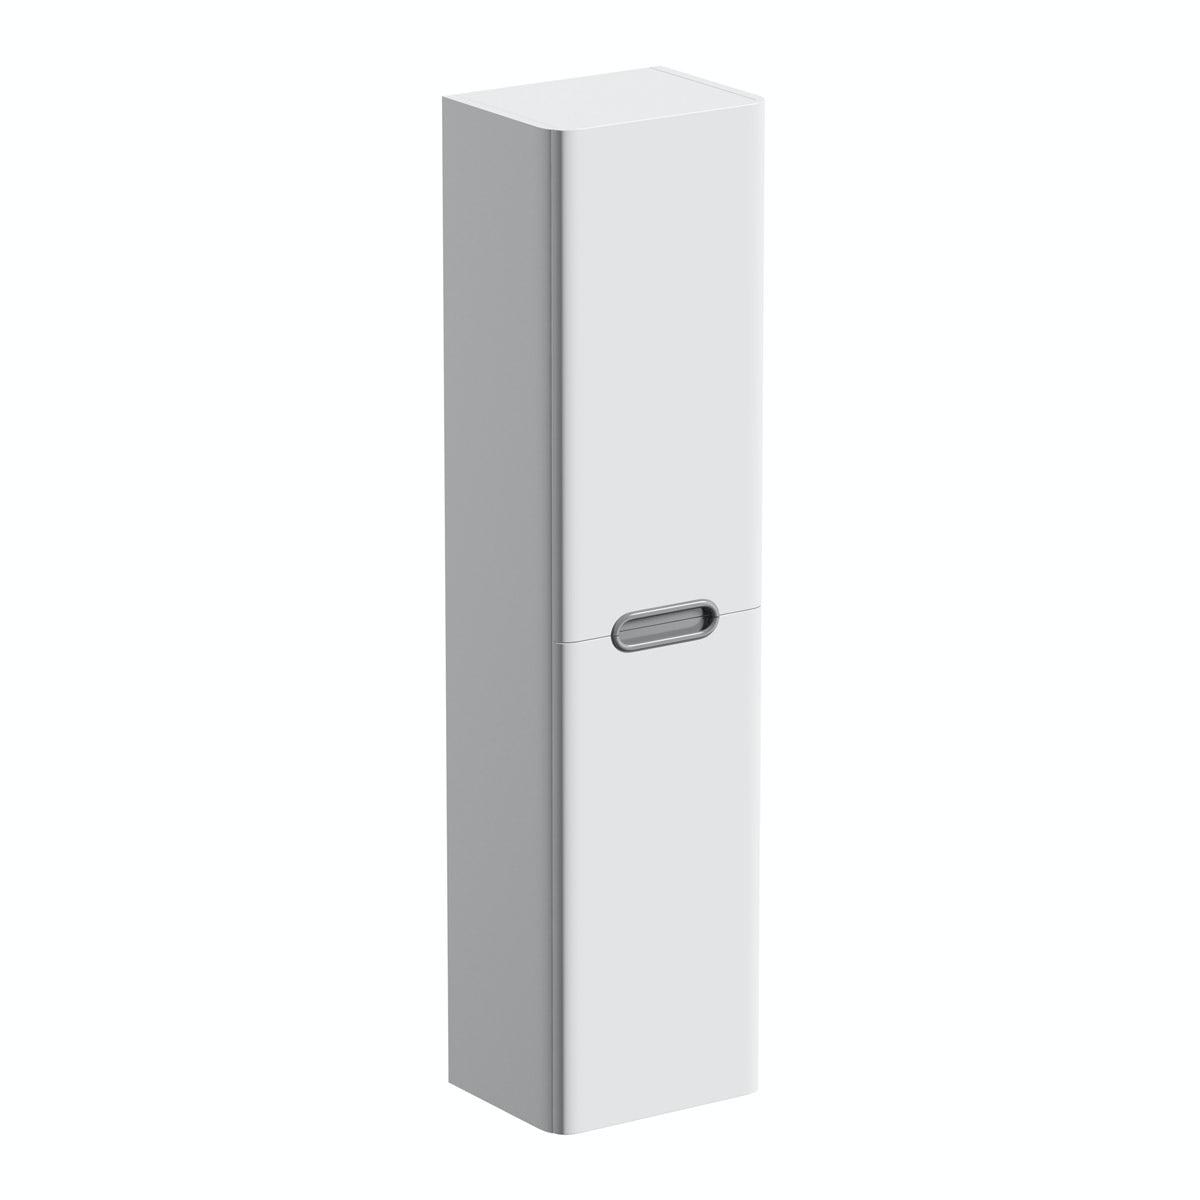 Sherwood  wall mounted storage in white